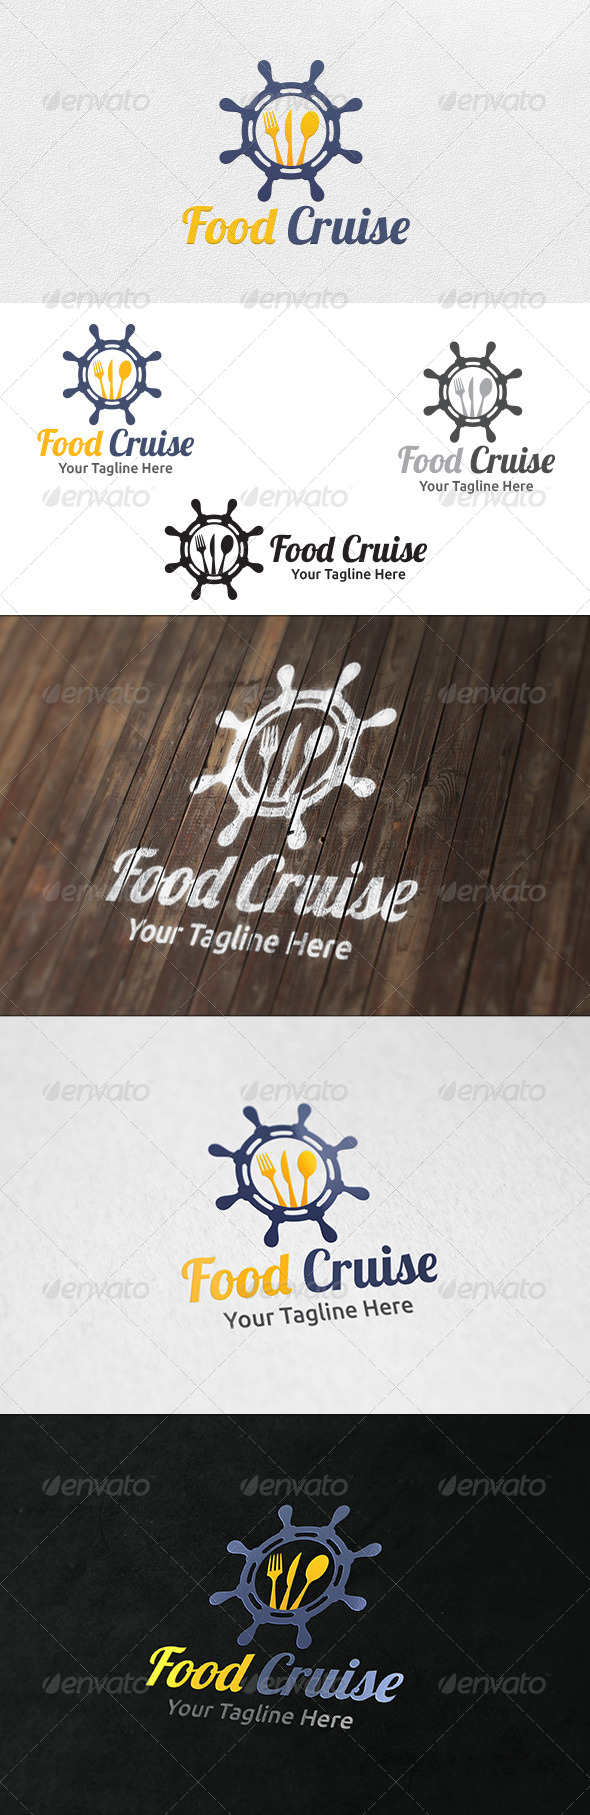 Food Cruise - Logo Template - Food Logo Templates